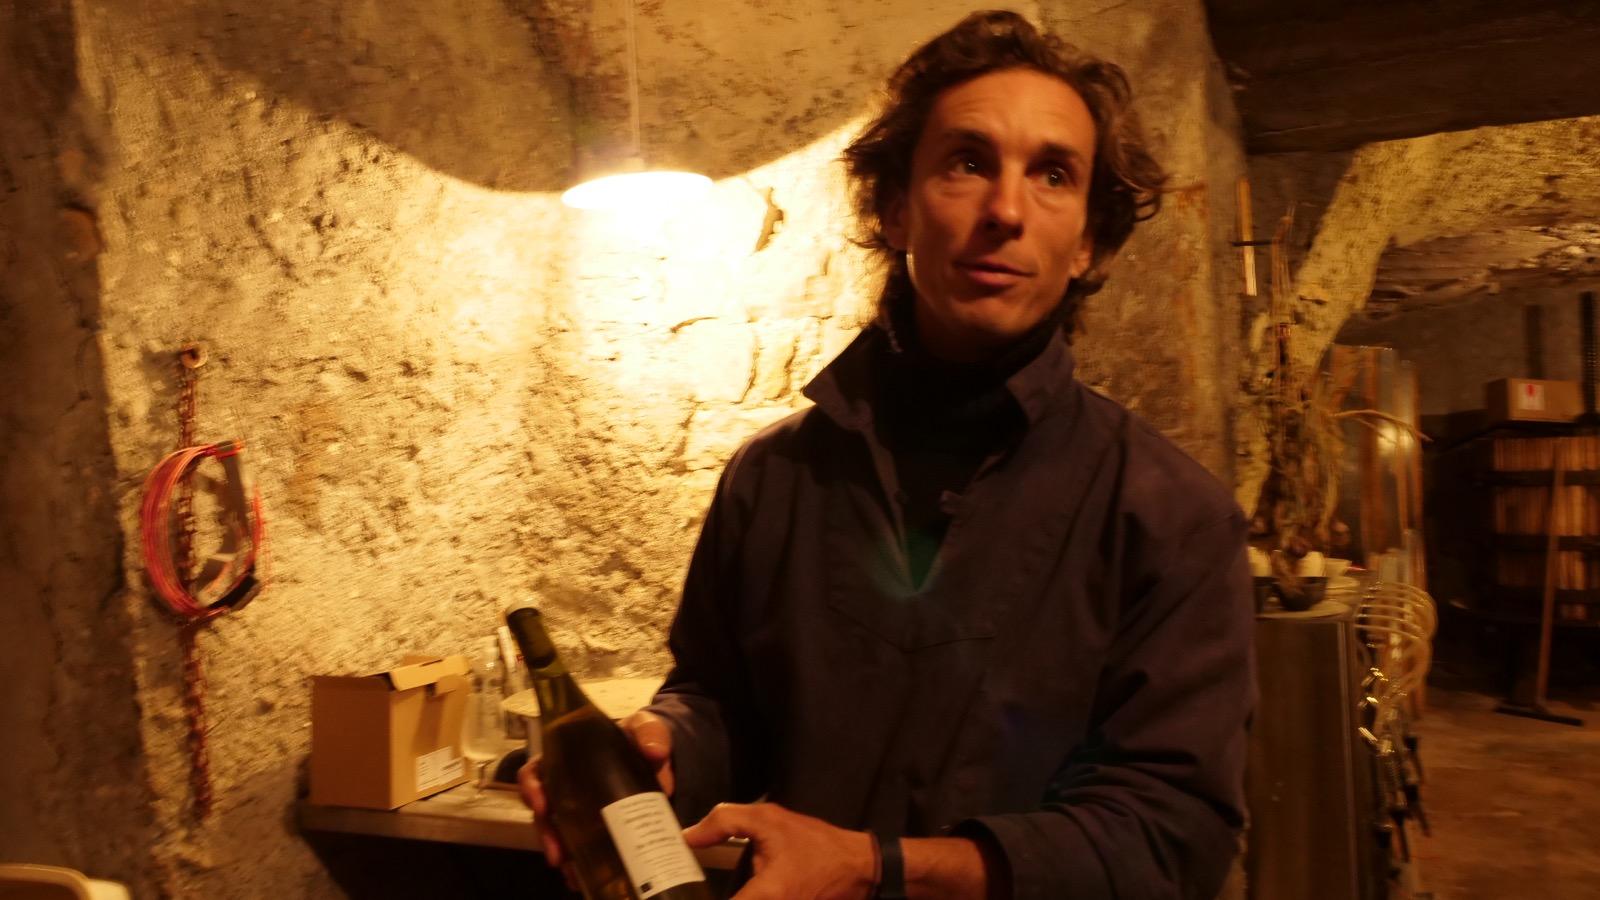 Anders Frederik Steen : Je suis un winefollower